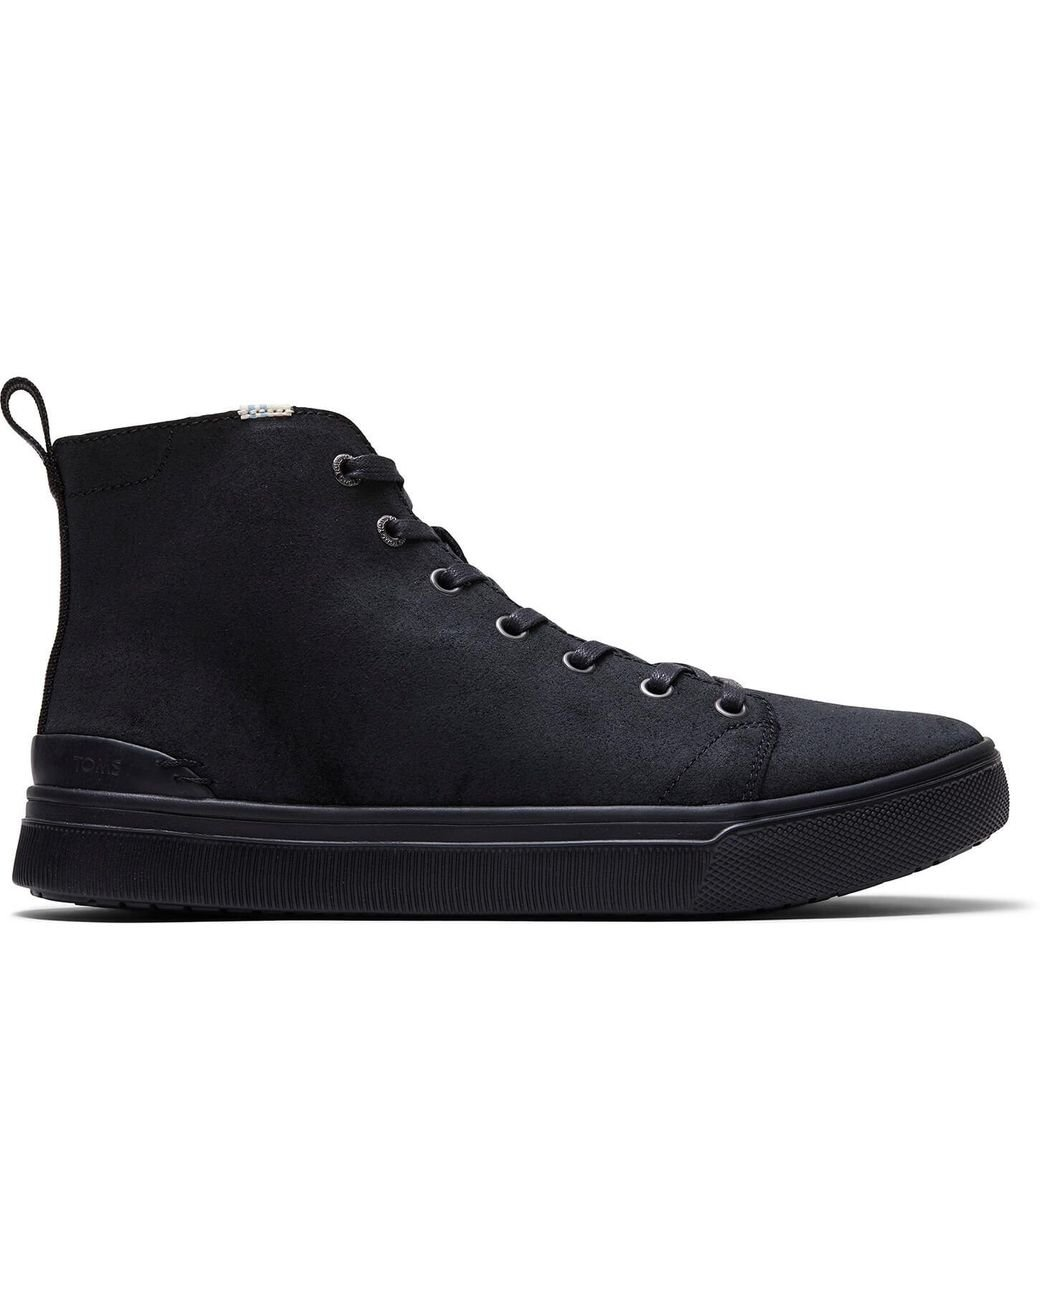 Schwarze Leder Trvl Lite High Top Sneakers Für Schuhe